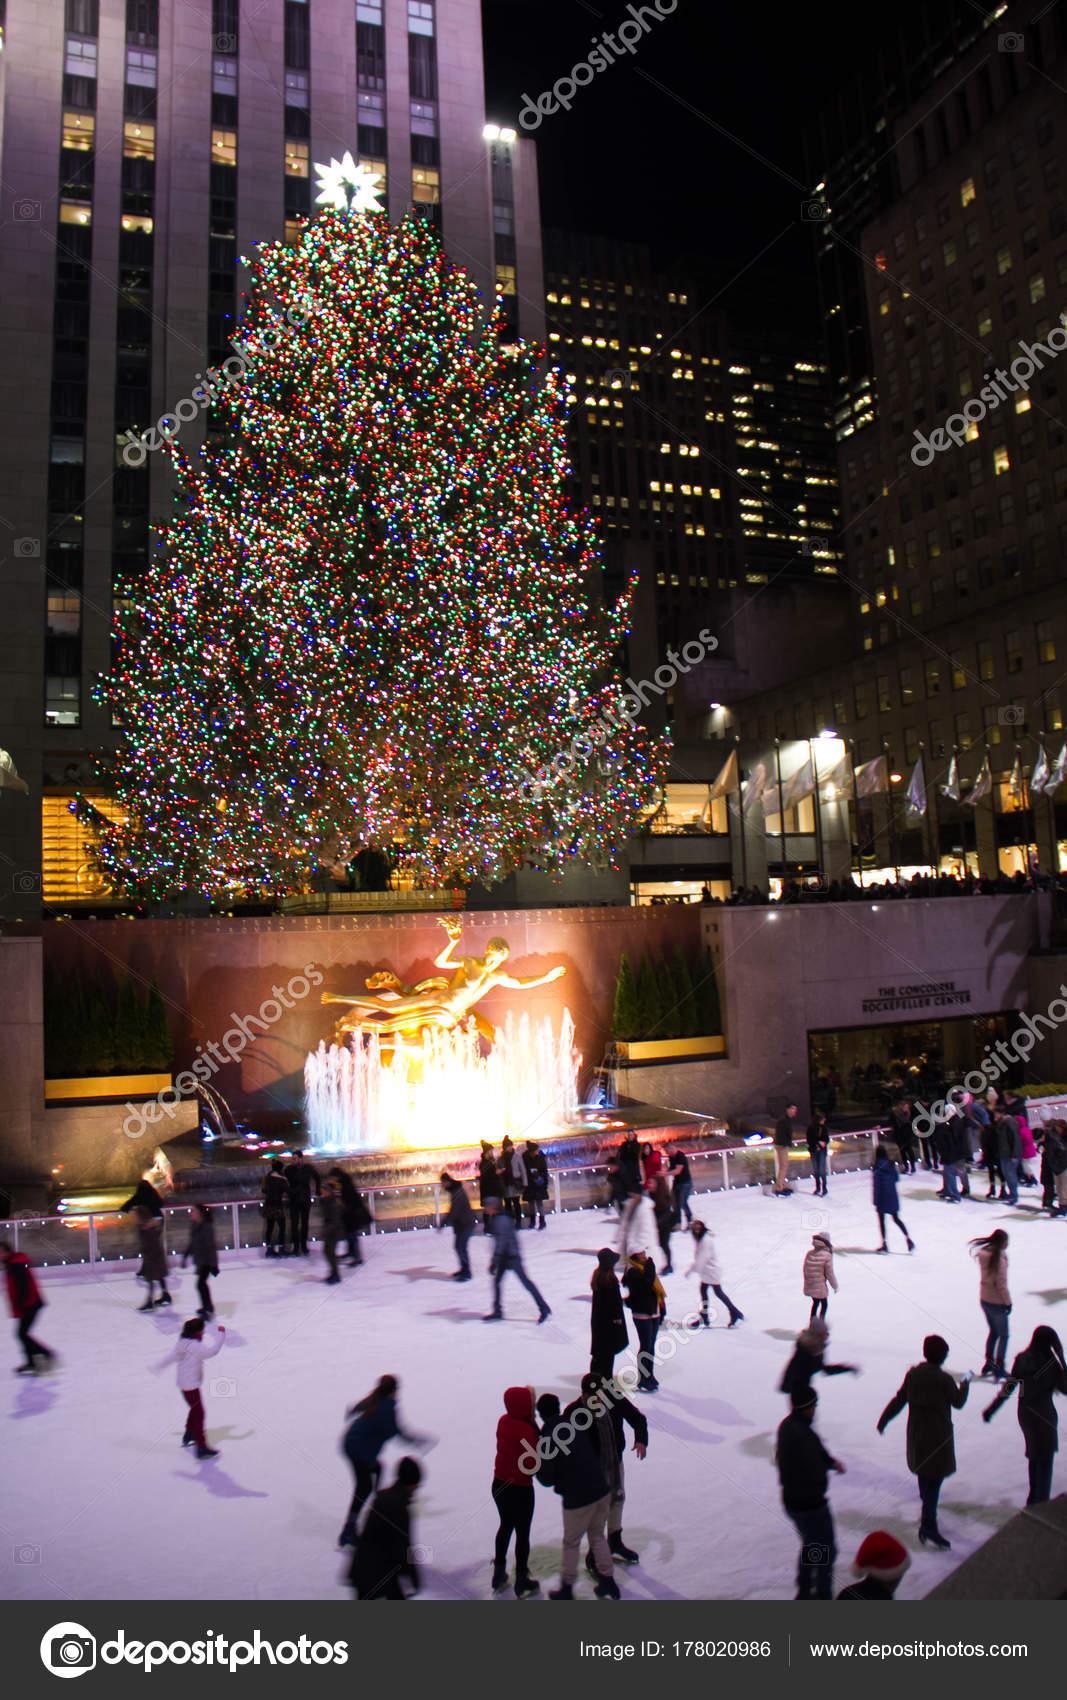 Christmas Ice Skating Rink Decoration.Manhattan New York December 2017 People Ice Skating Rink